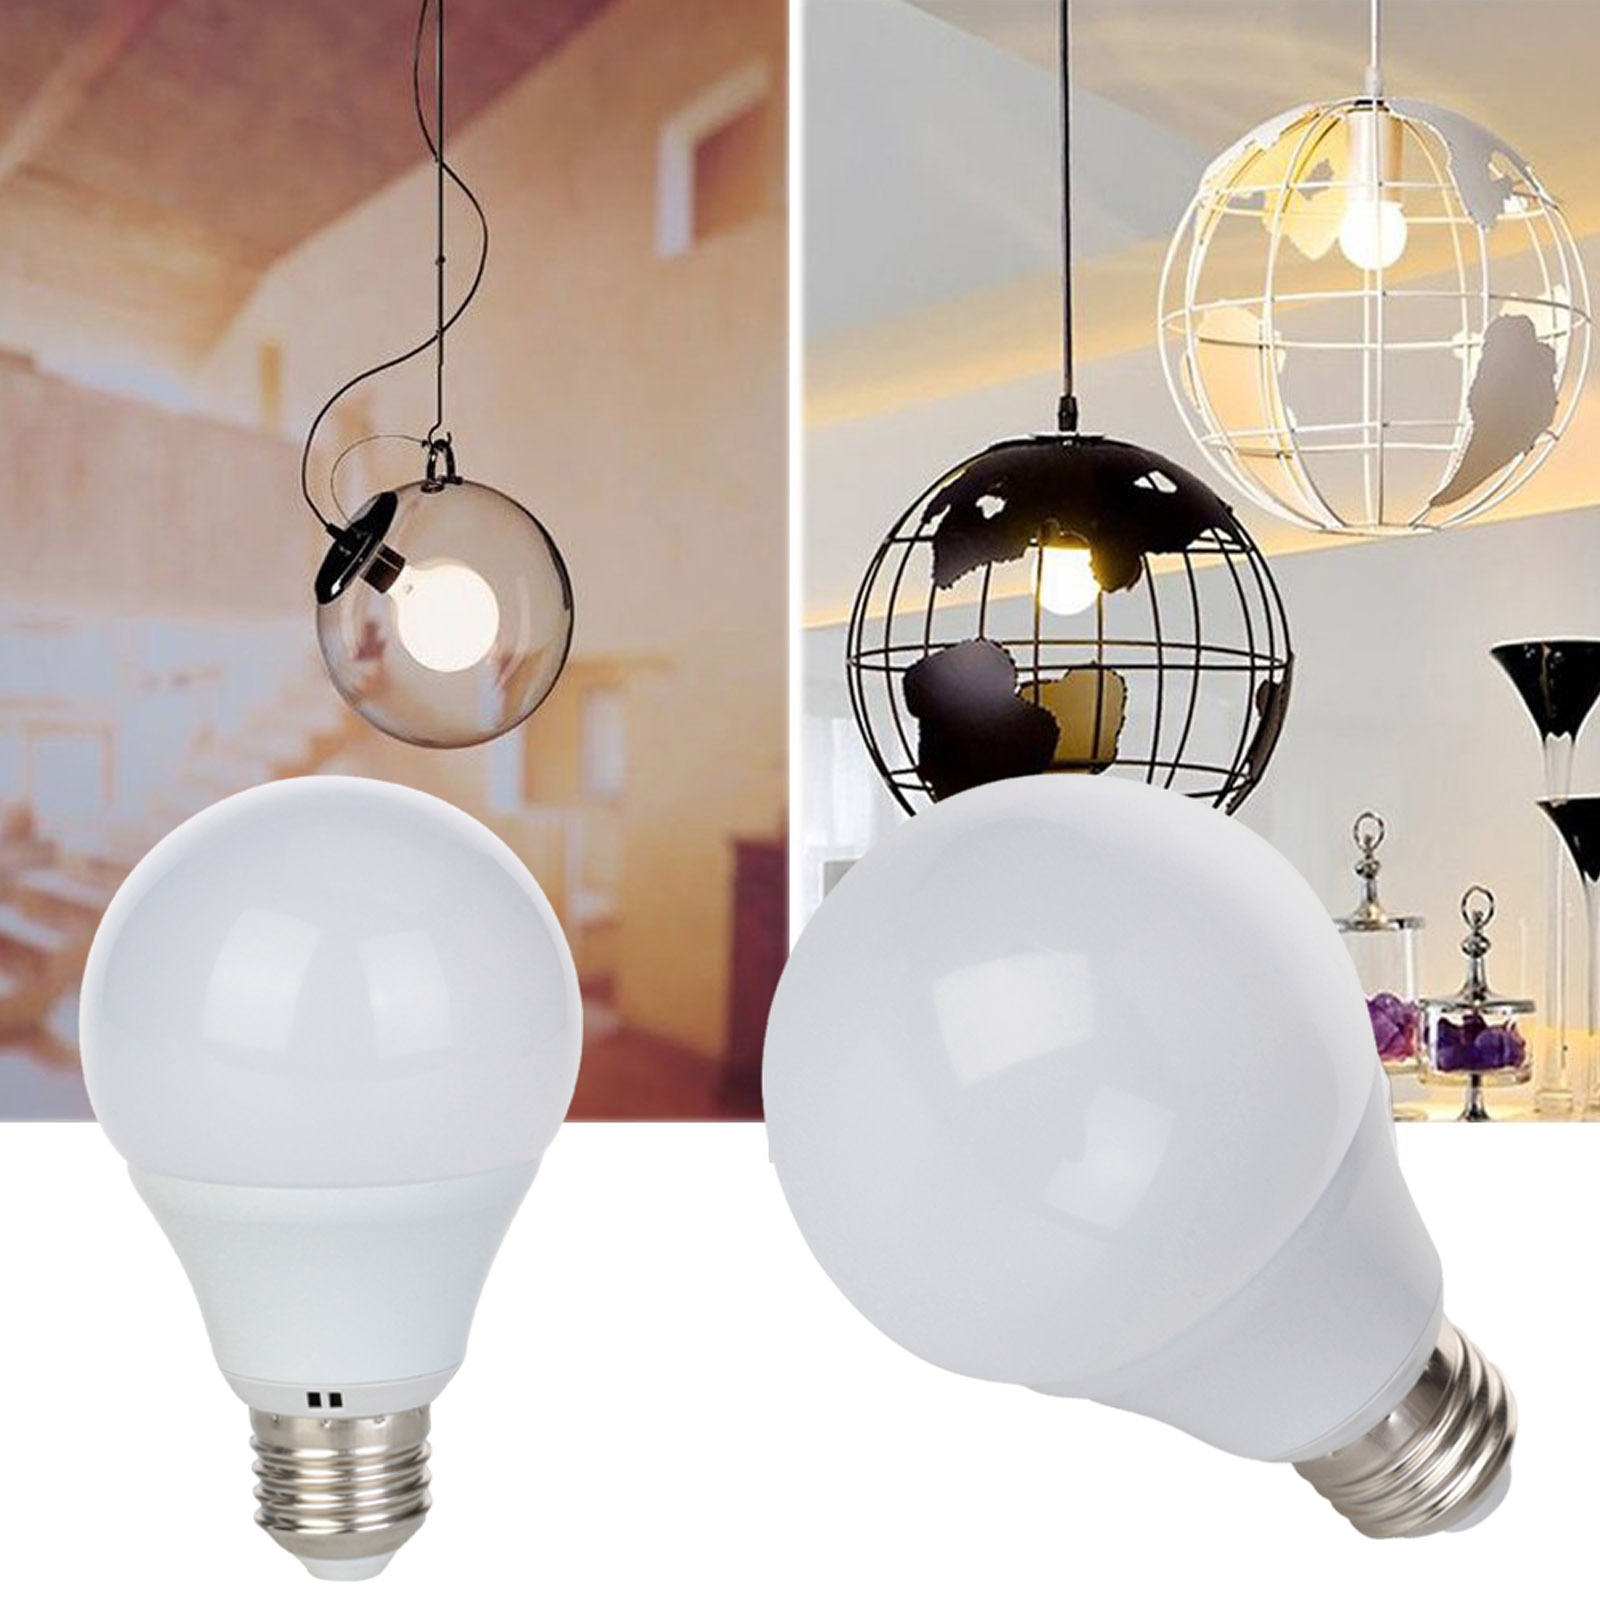 Dimmable Led Globe Light Bulb B22 Bayonet 3w 5w 7w 9w E27 220v White Dimmer Lamp Bright Ebay